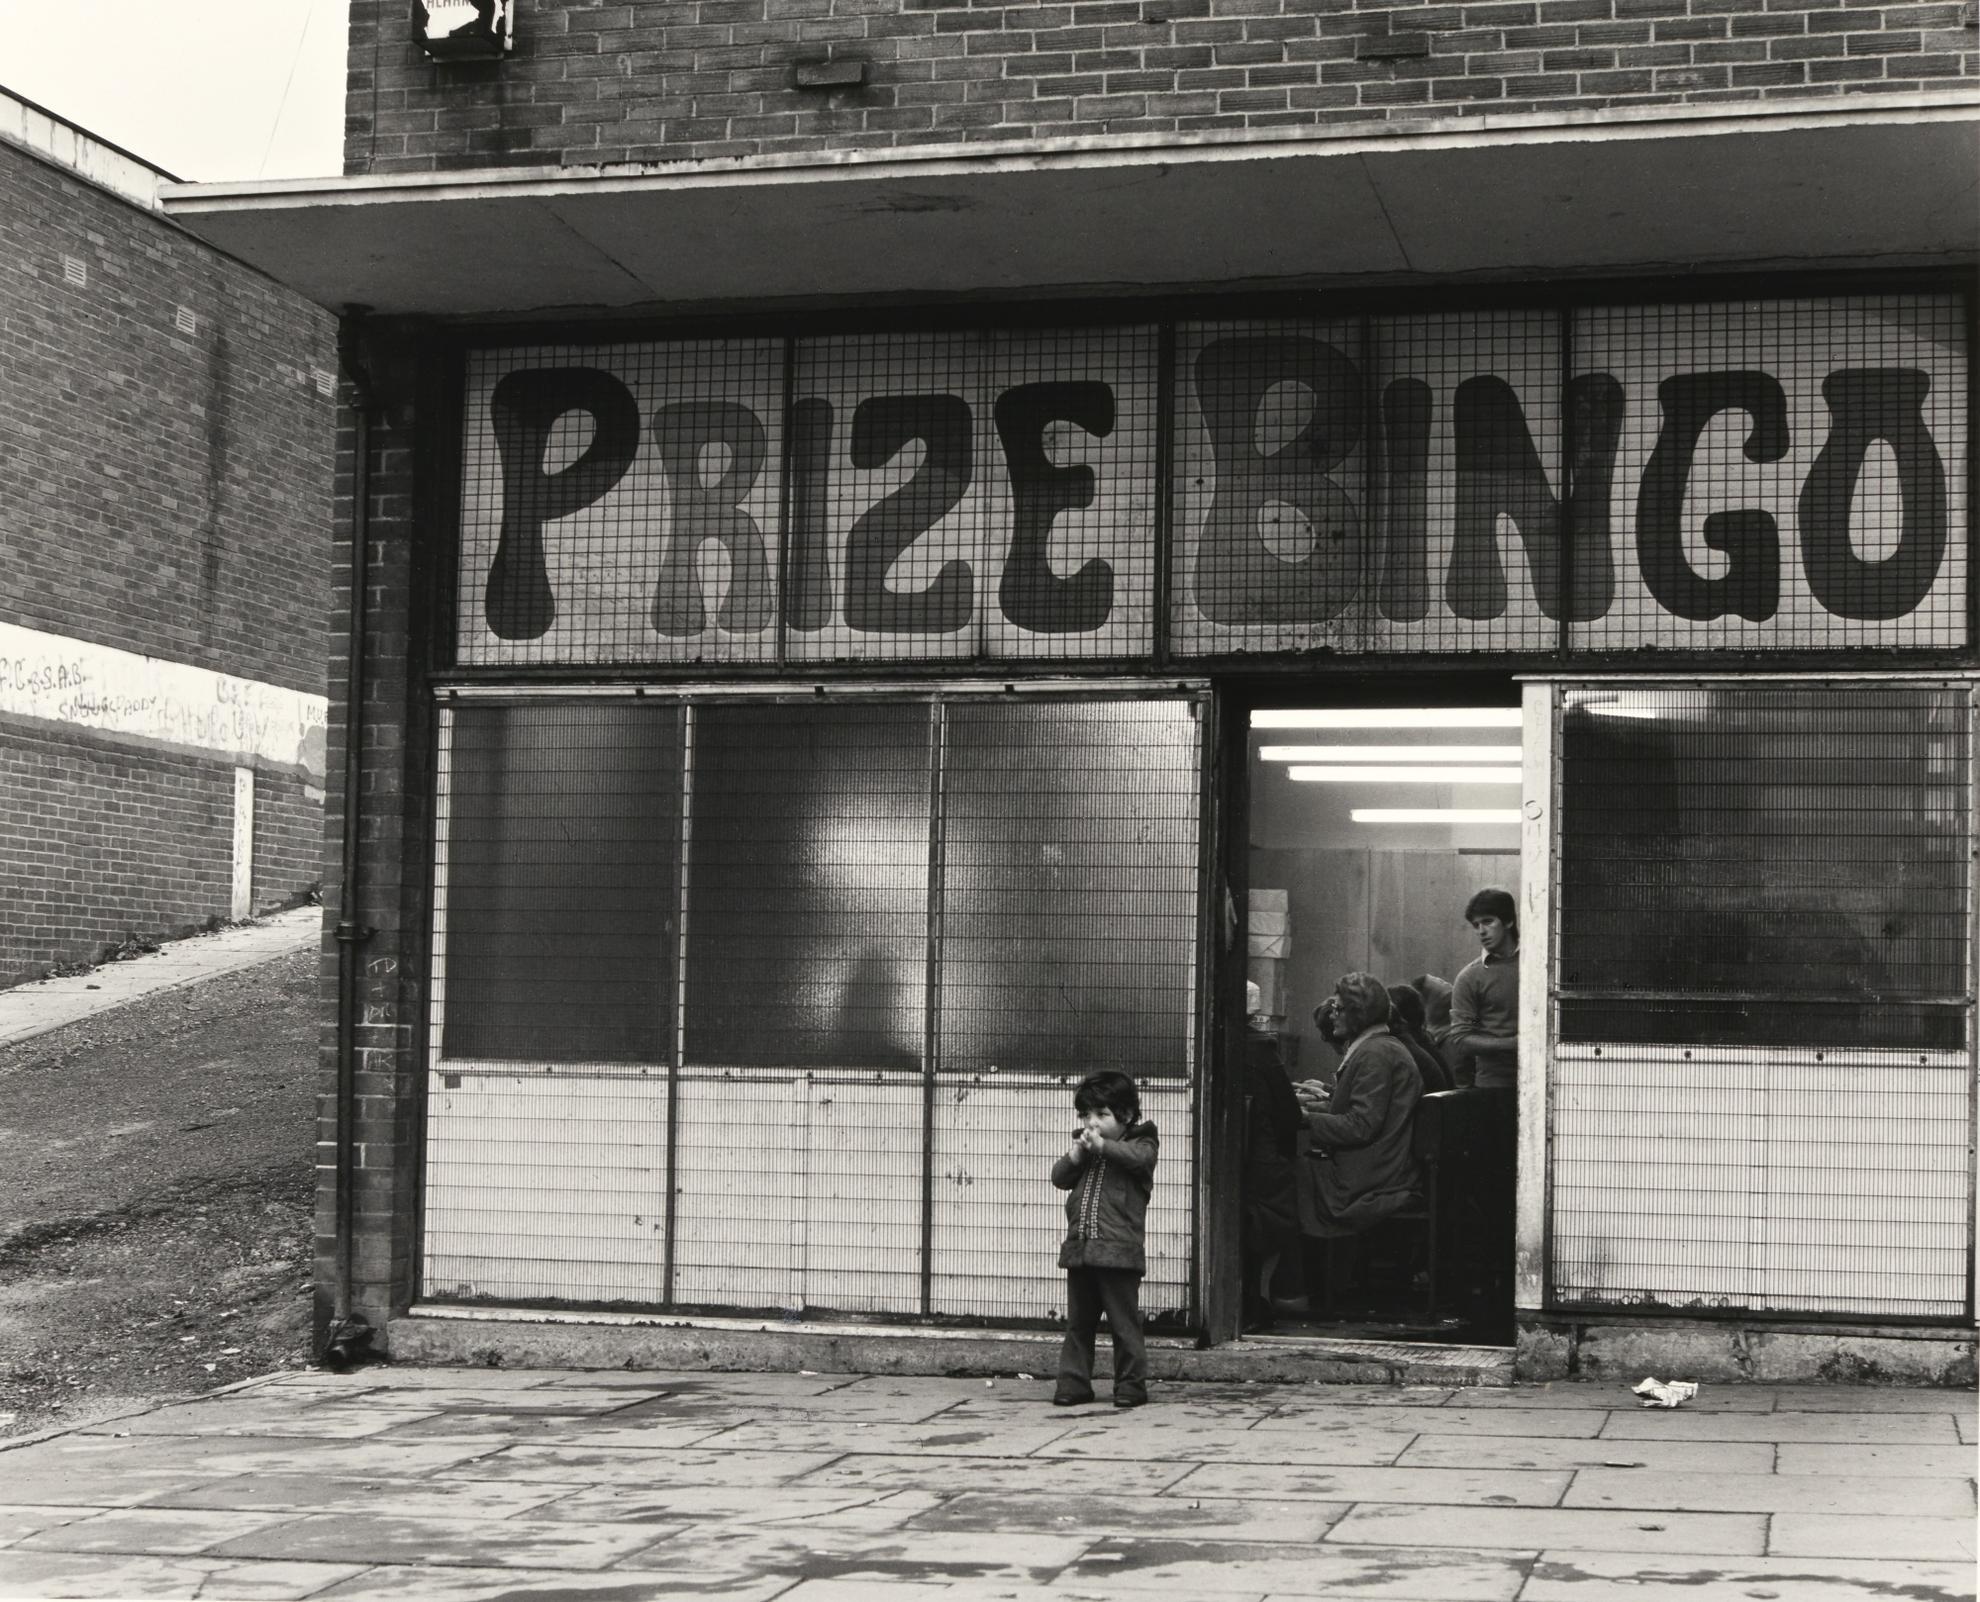 Chris Killip-Bingo, West-End, Newcastle-1975